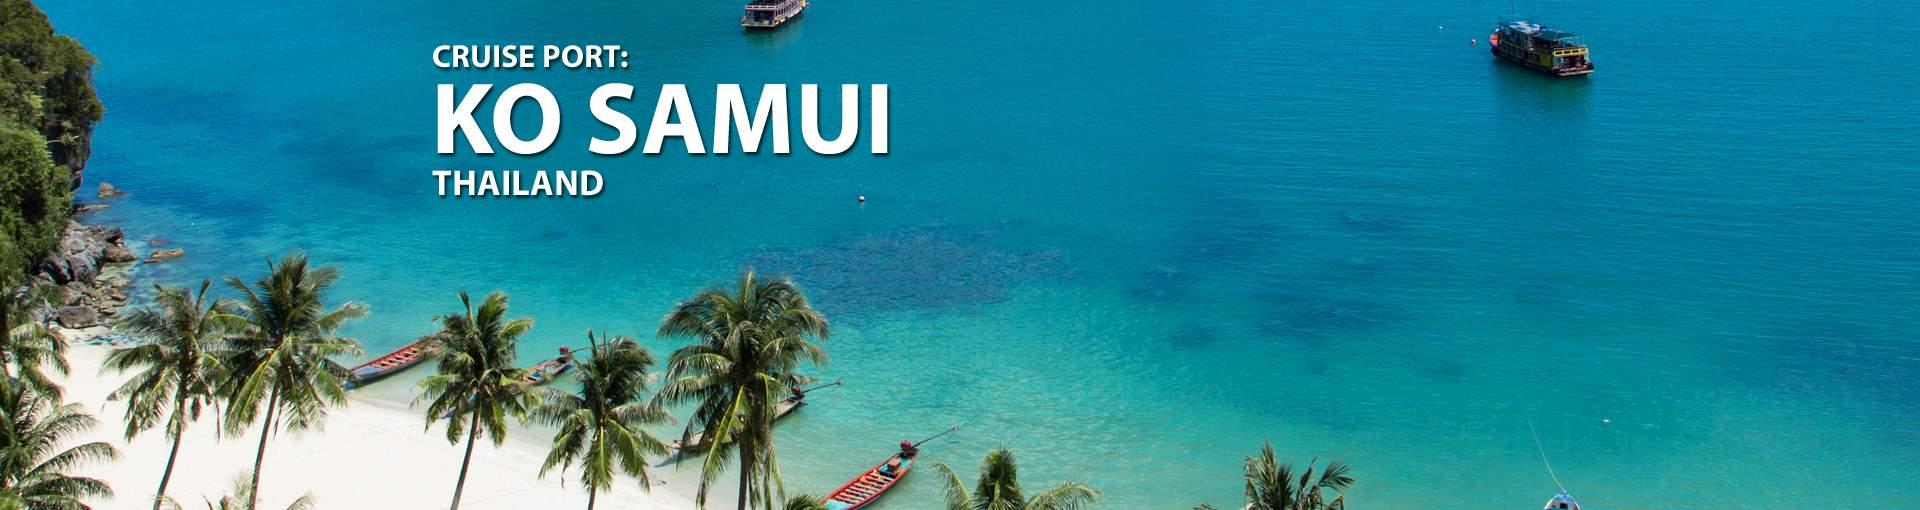 Cruises to Ko Samui, Thailand